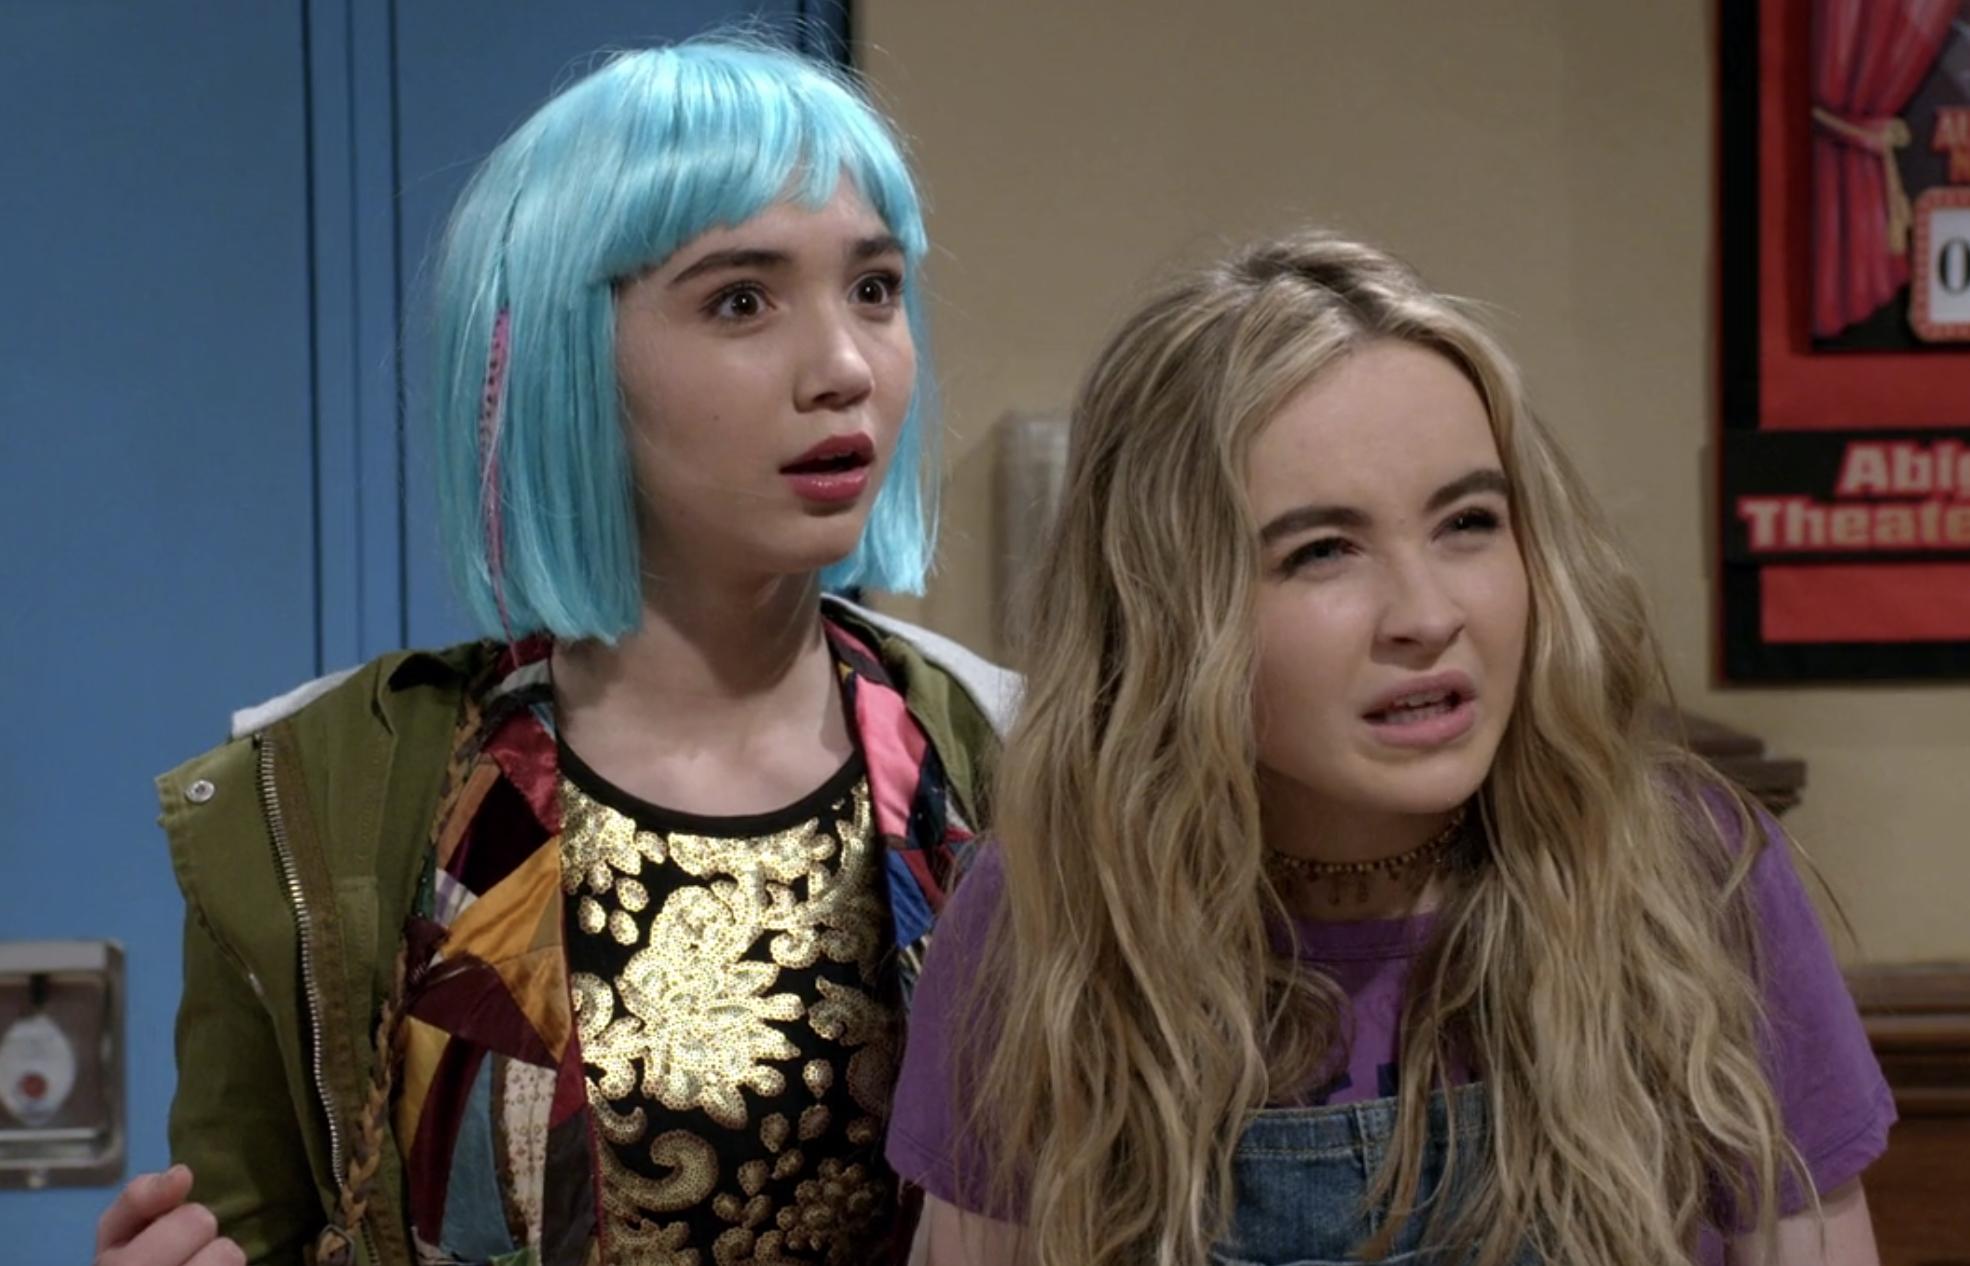 Riley, wearing a short bob wig, and Maya squint in confusion